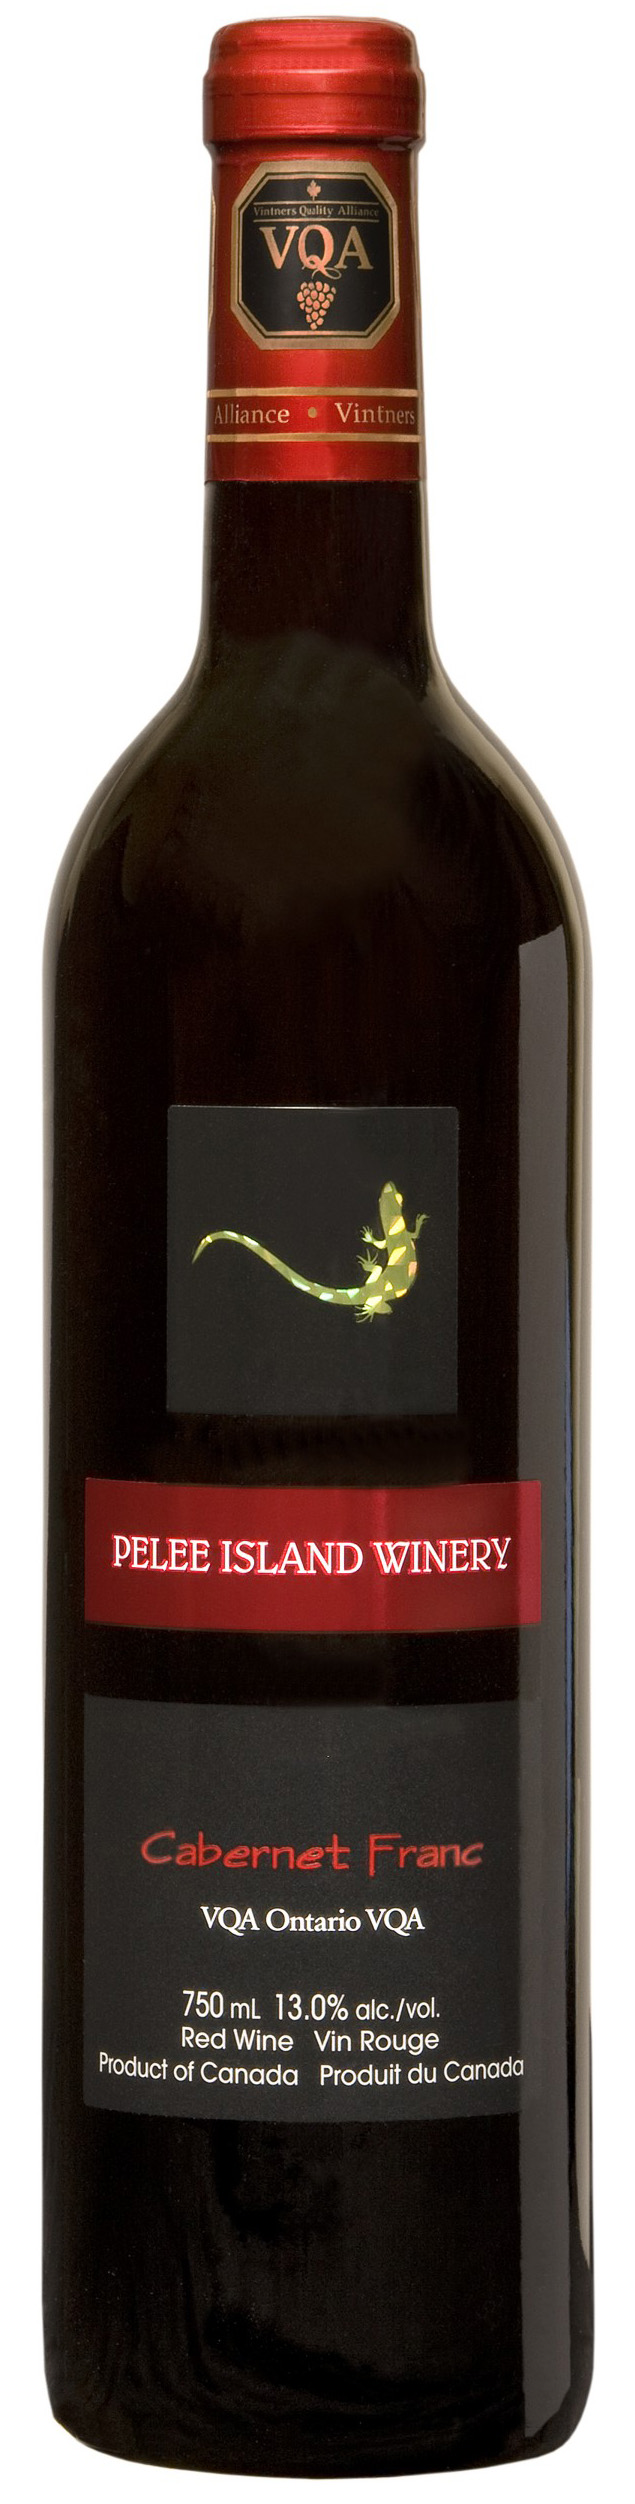 Pelee Island Cabernet Franc 2009